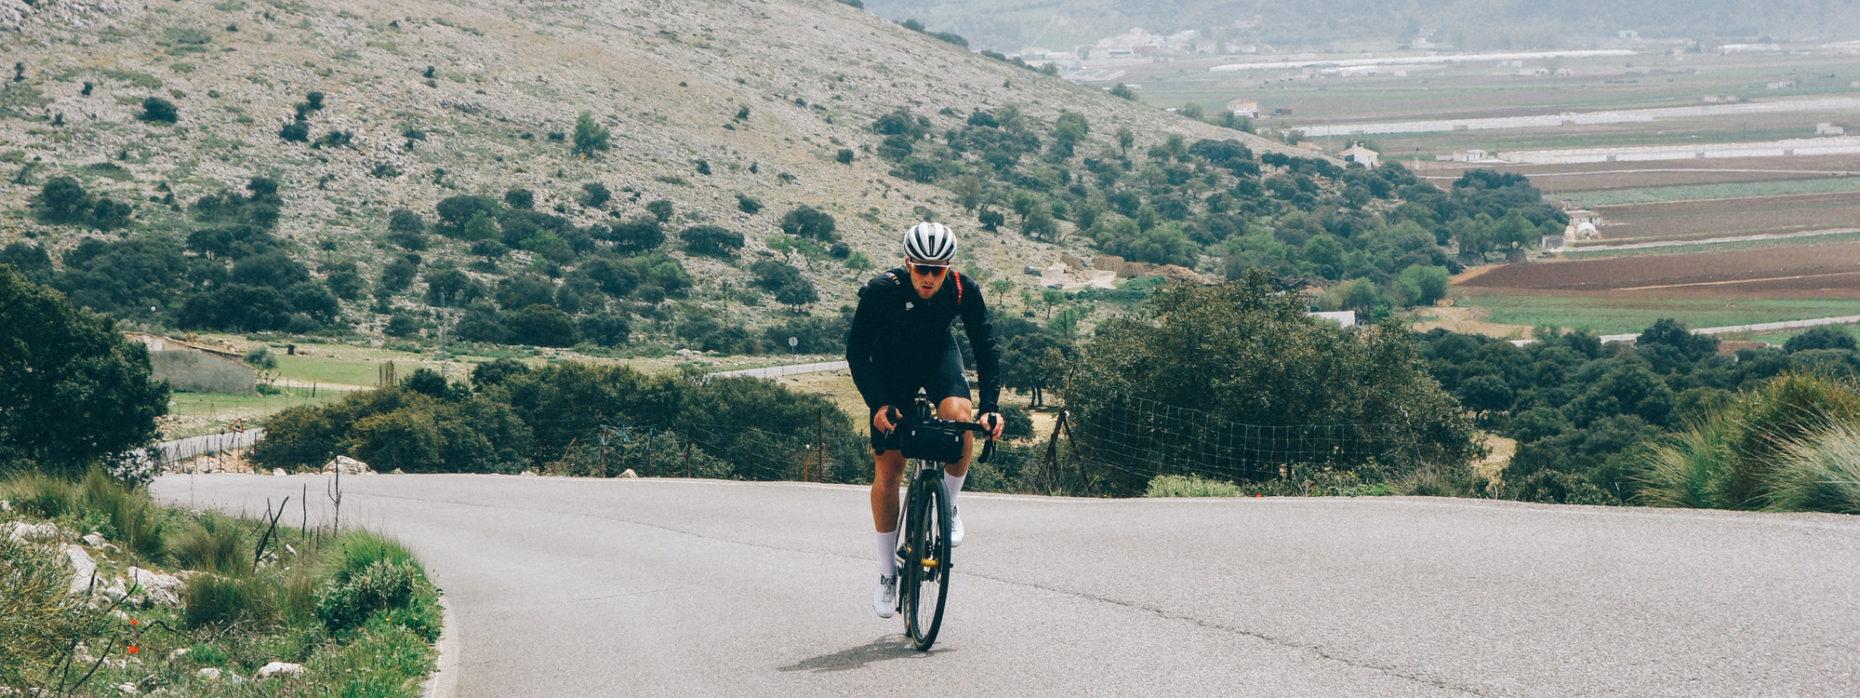 Picture of Daan van Meeuwen by Szymonbike in Spain